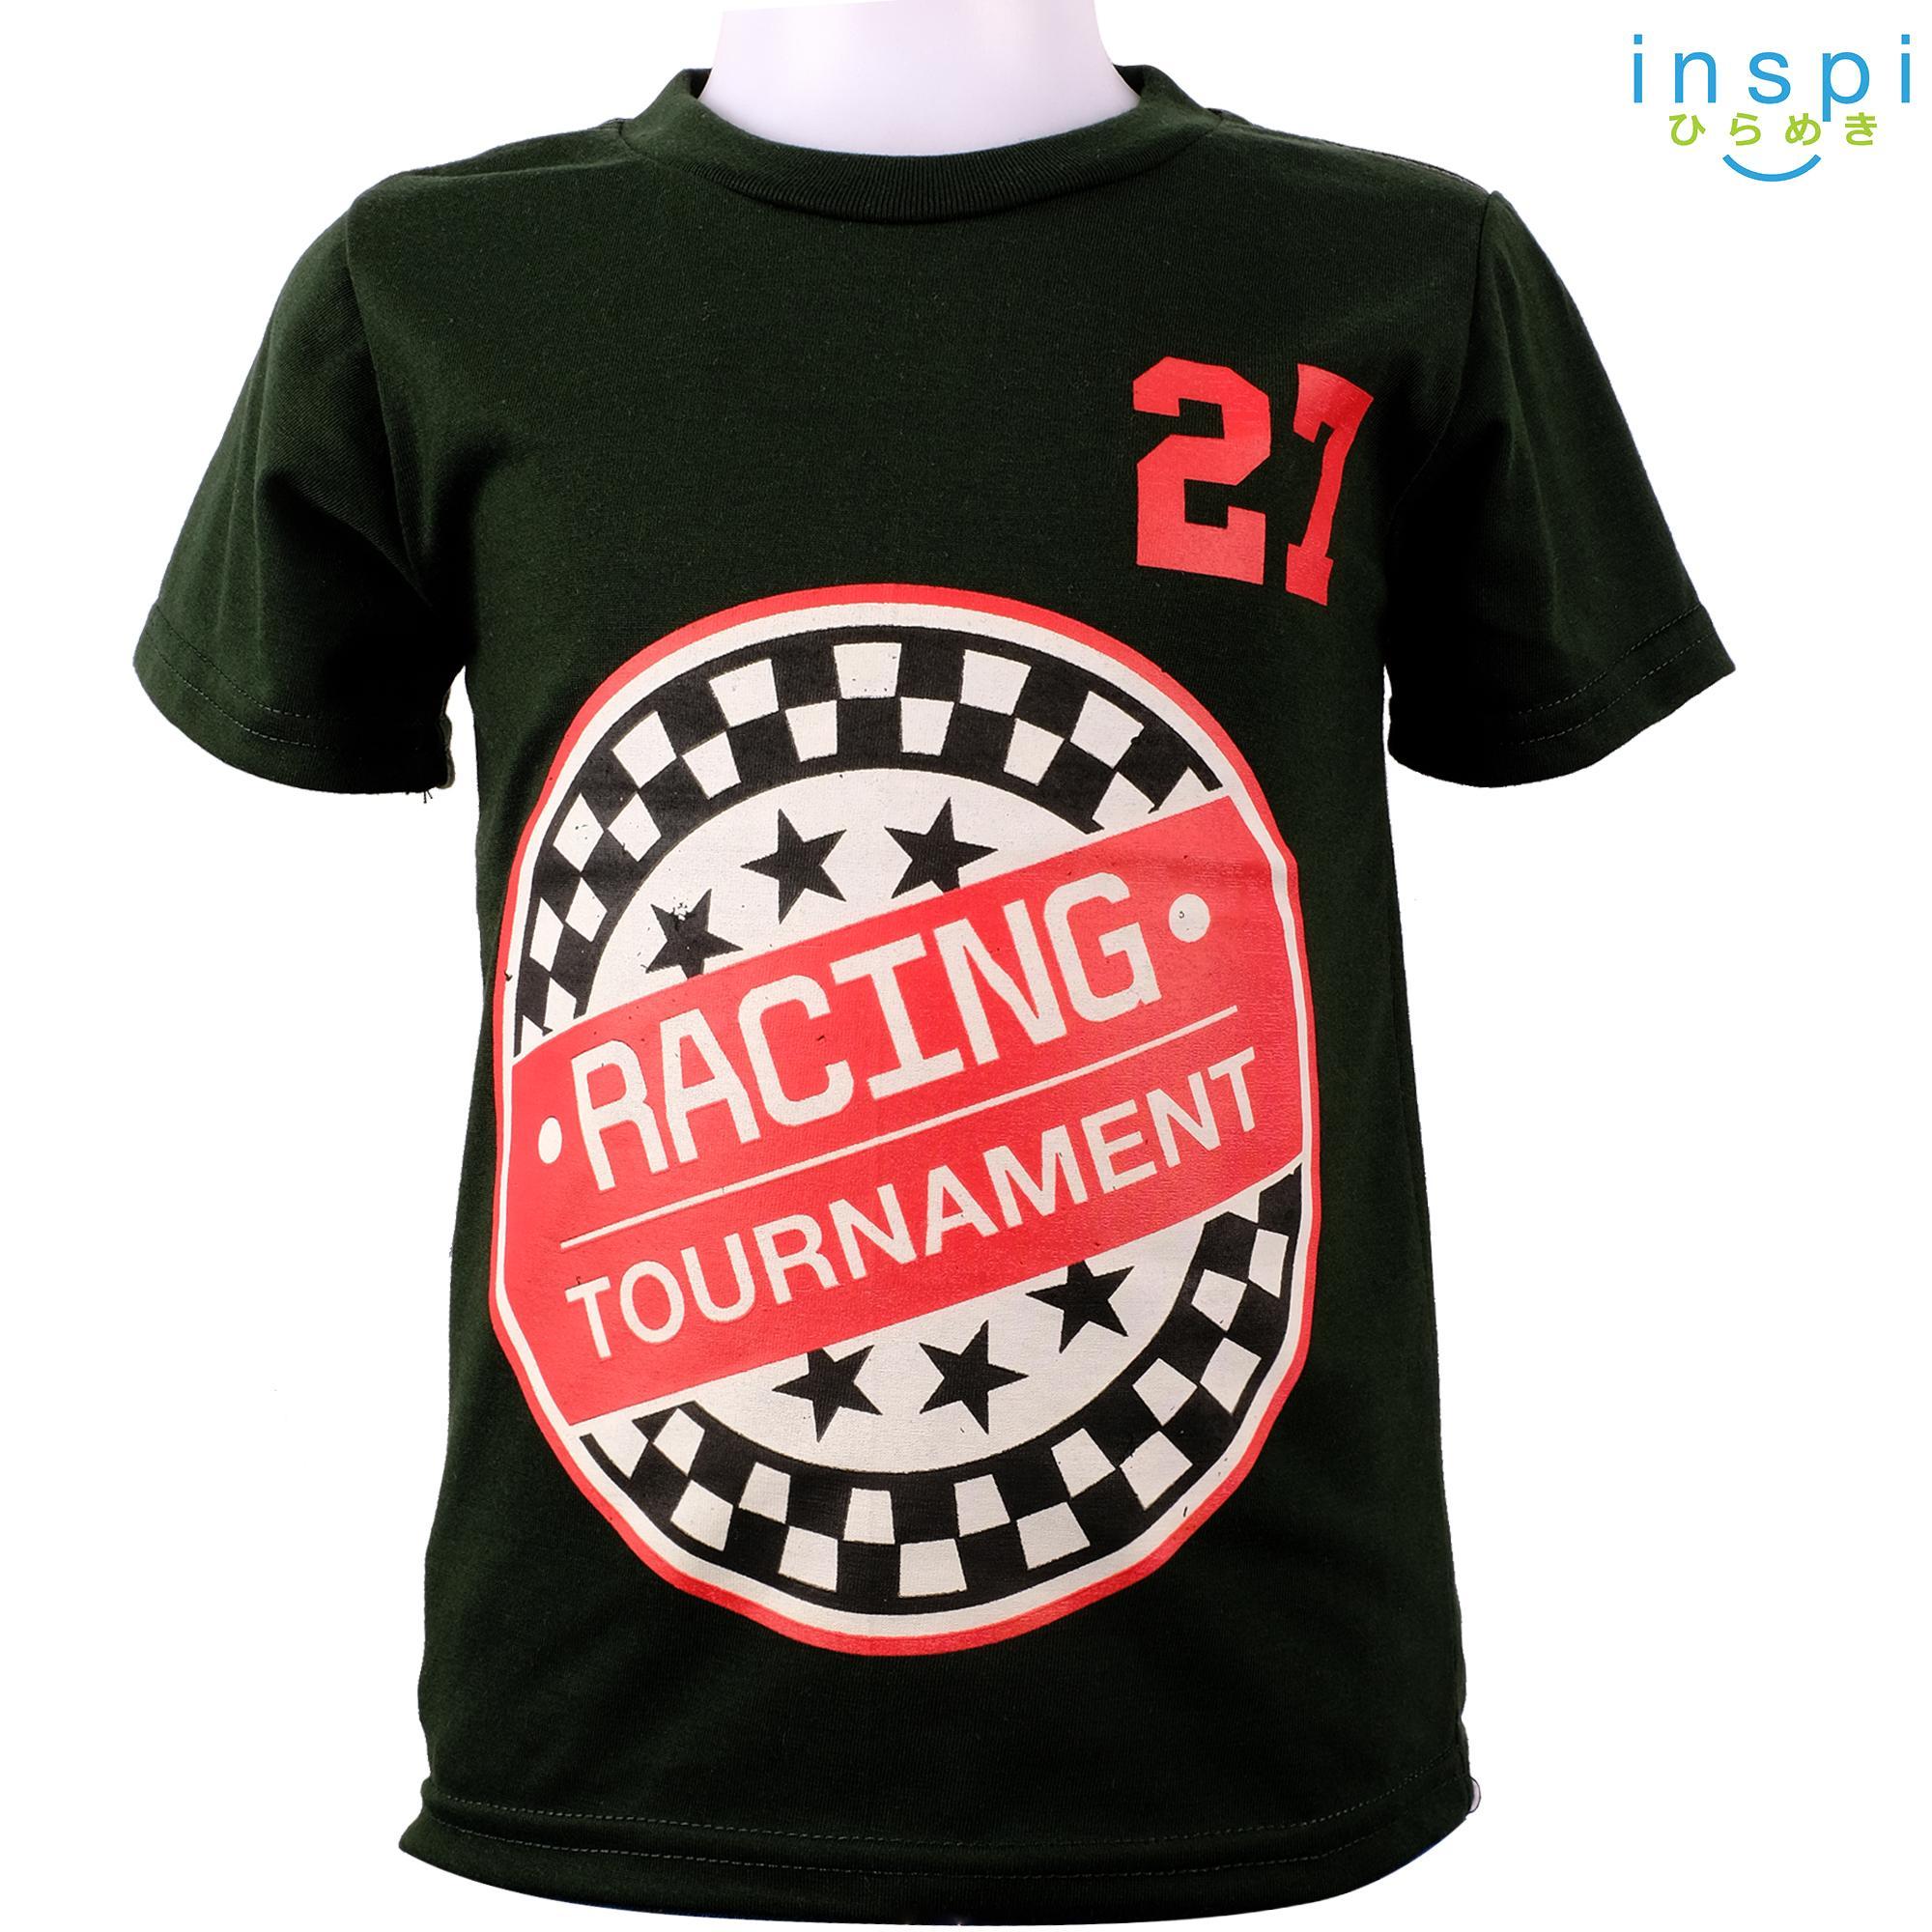 Roblox High School Custom Shirt Codes Polo T Shirts Outlet